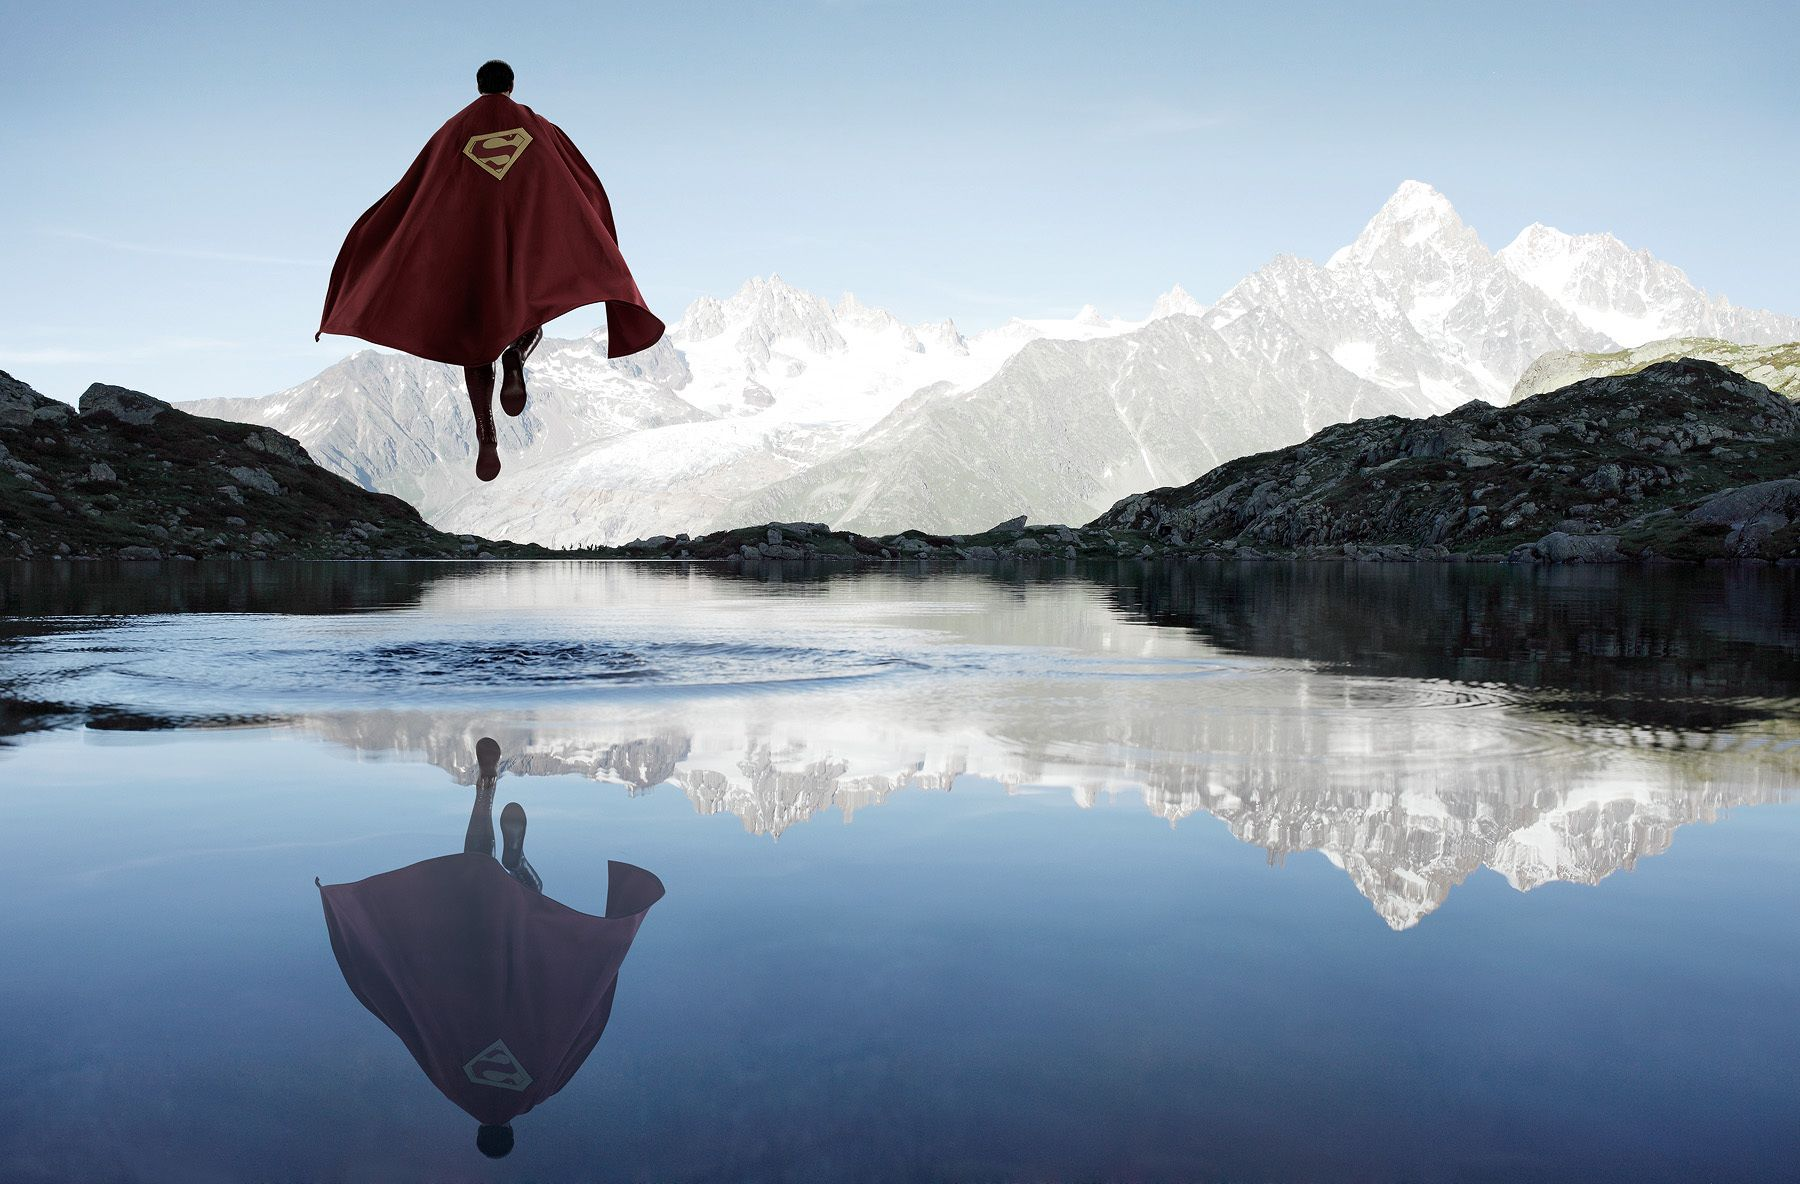 Portraits of Superheroes di Benoit Lapray